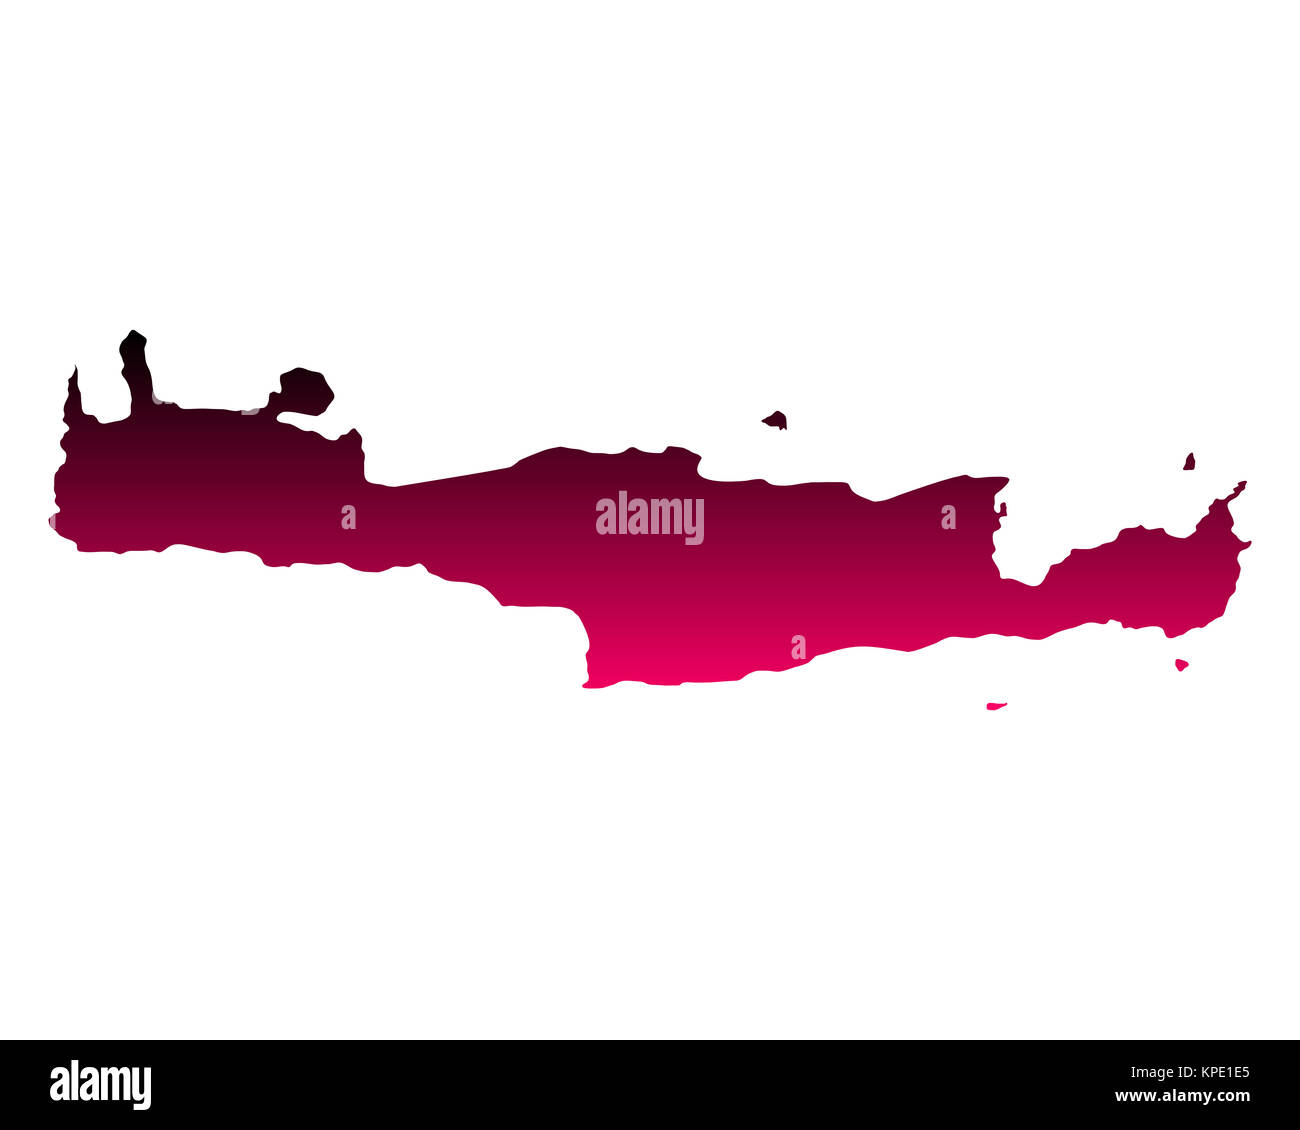 Karte von Kreta - Stock Image